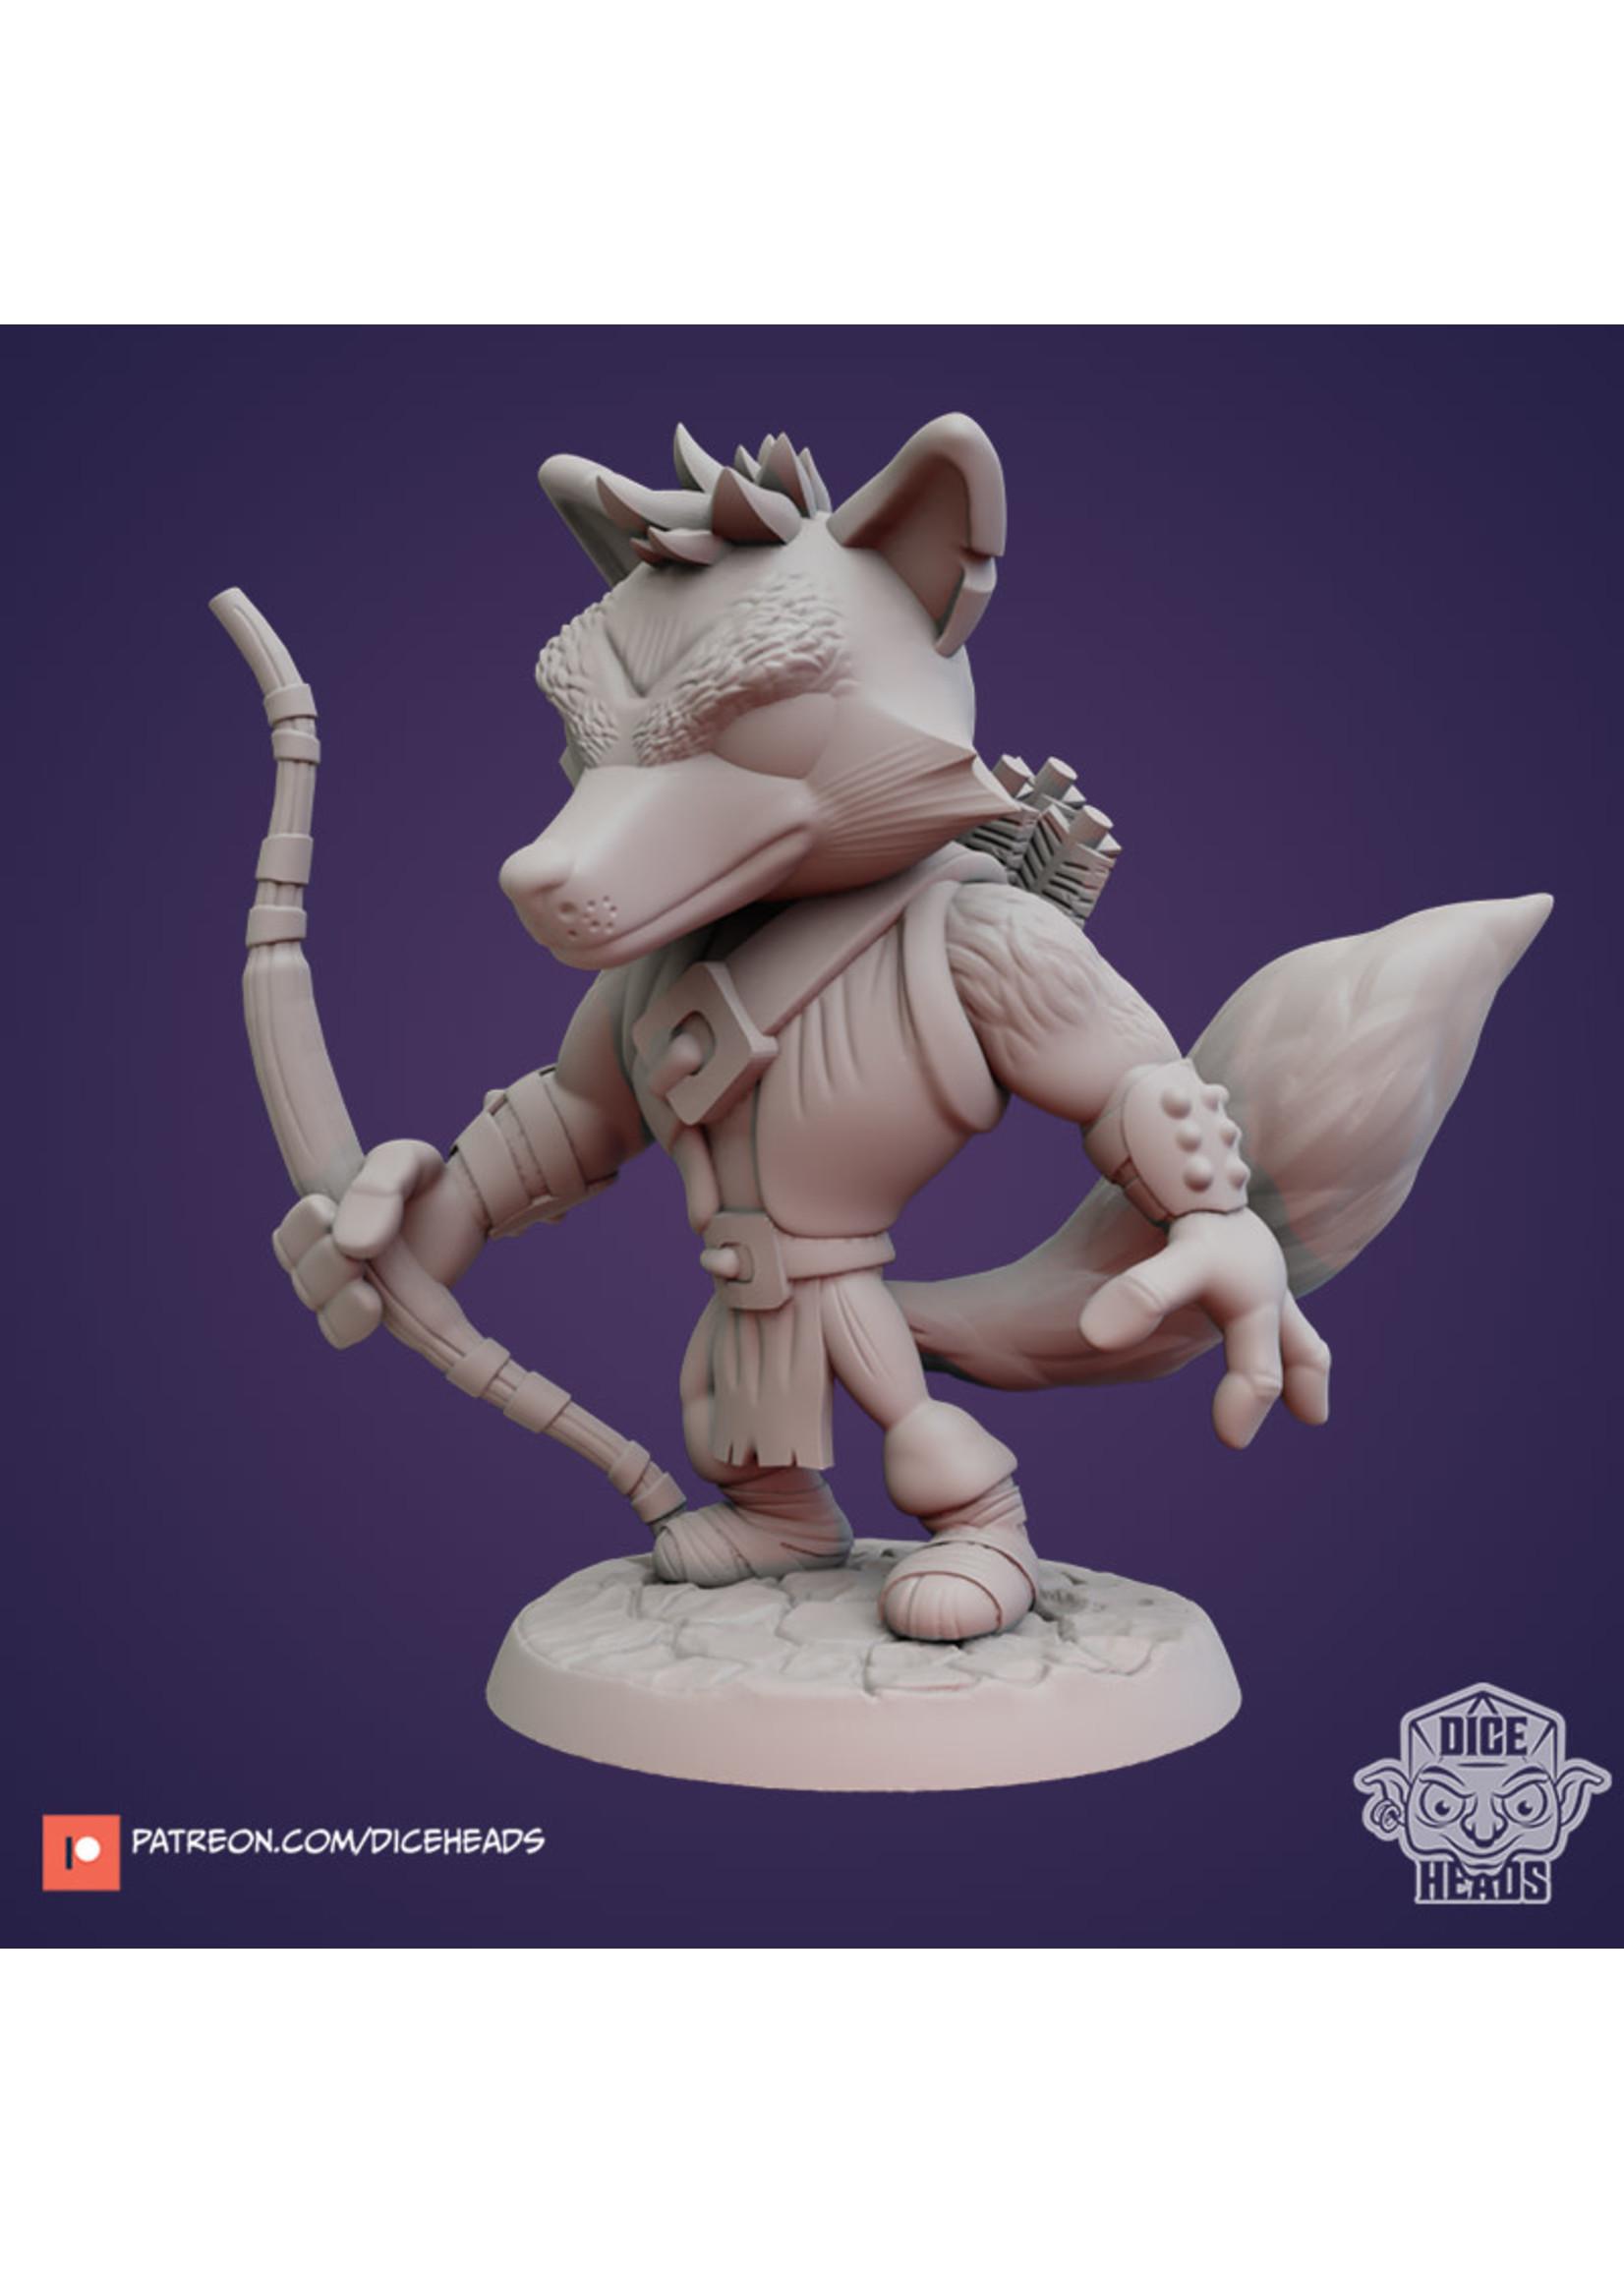 3D Printed Miniature - Kitsune Bandit - Dungeons & Dragons - Zoontalis KS